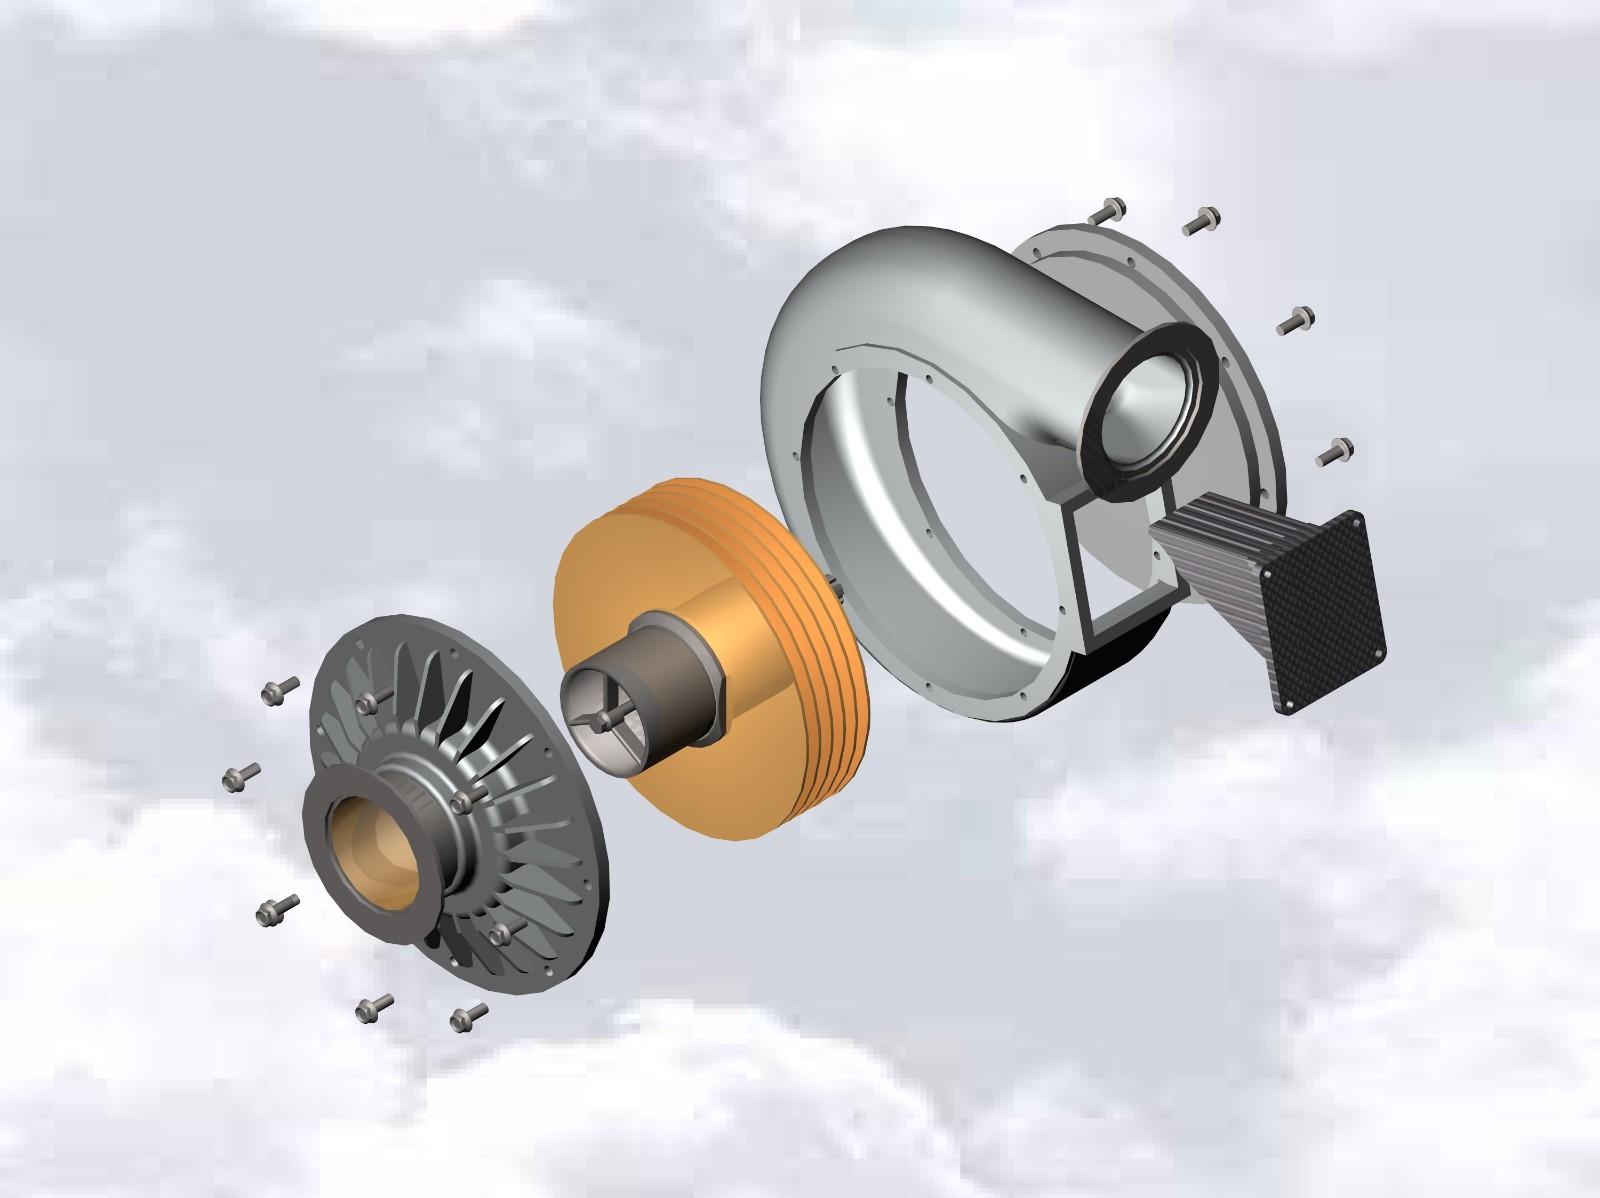 SolidWorks模型免费下载:特斯拉涡轮泵